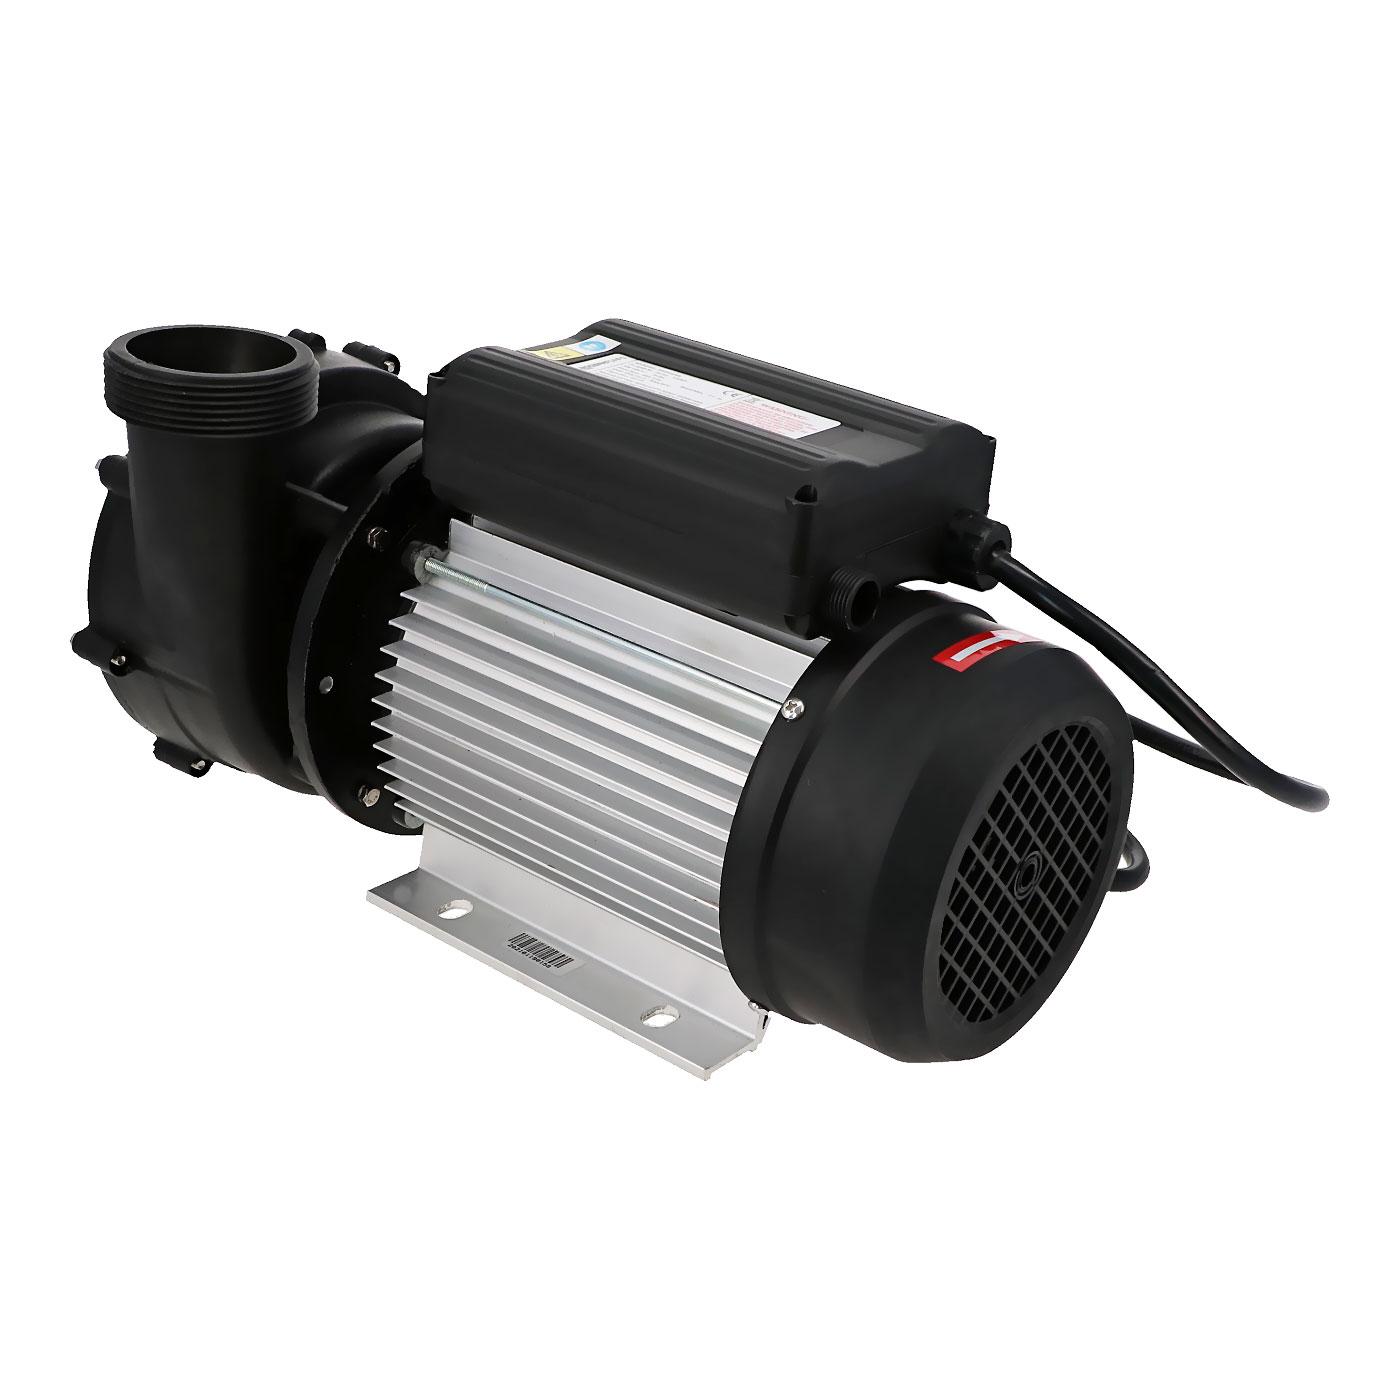 HSP2200 Spa massage pump